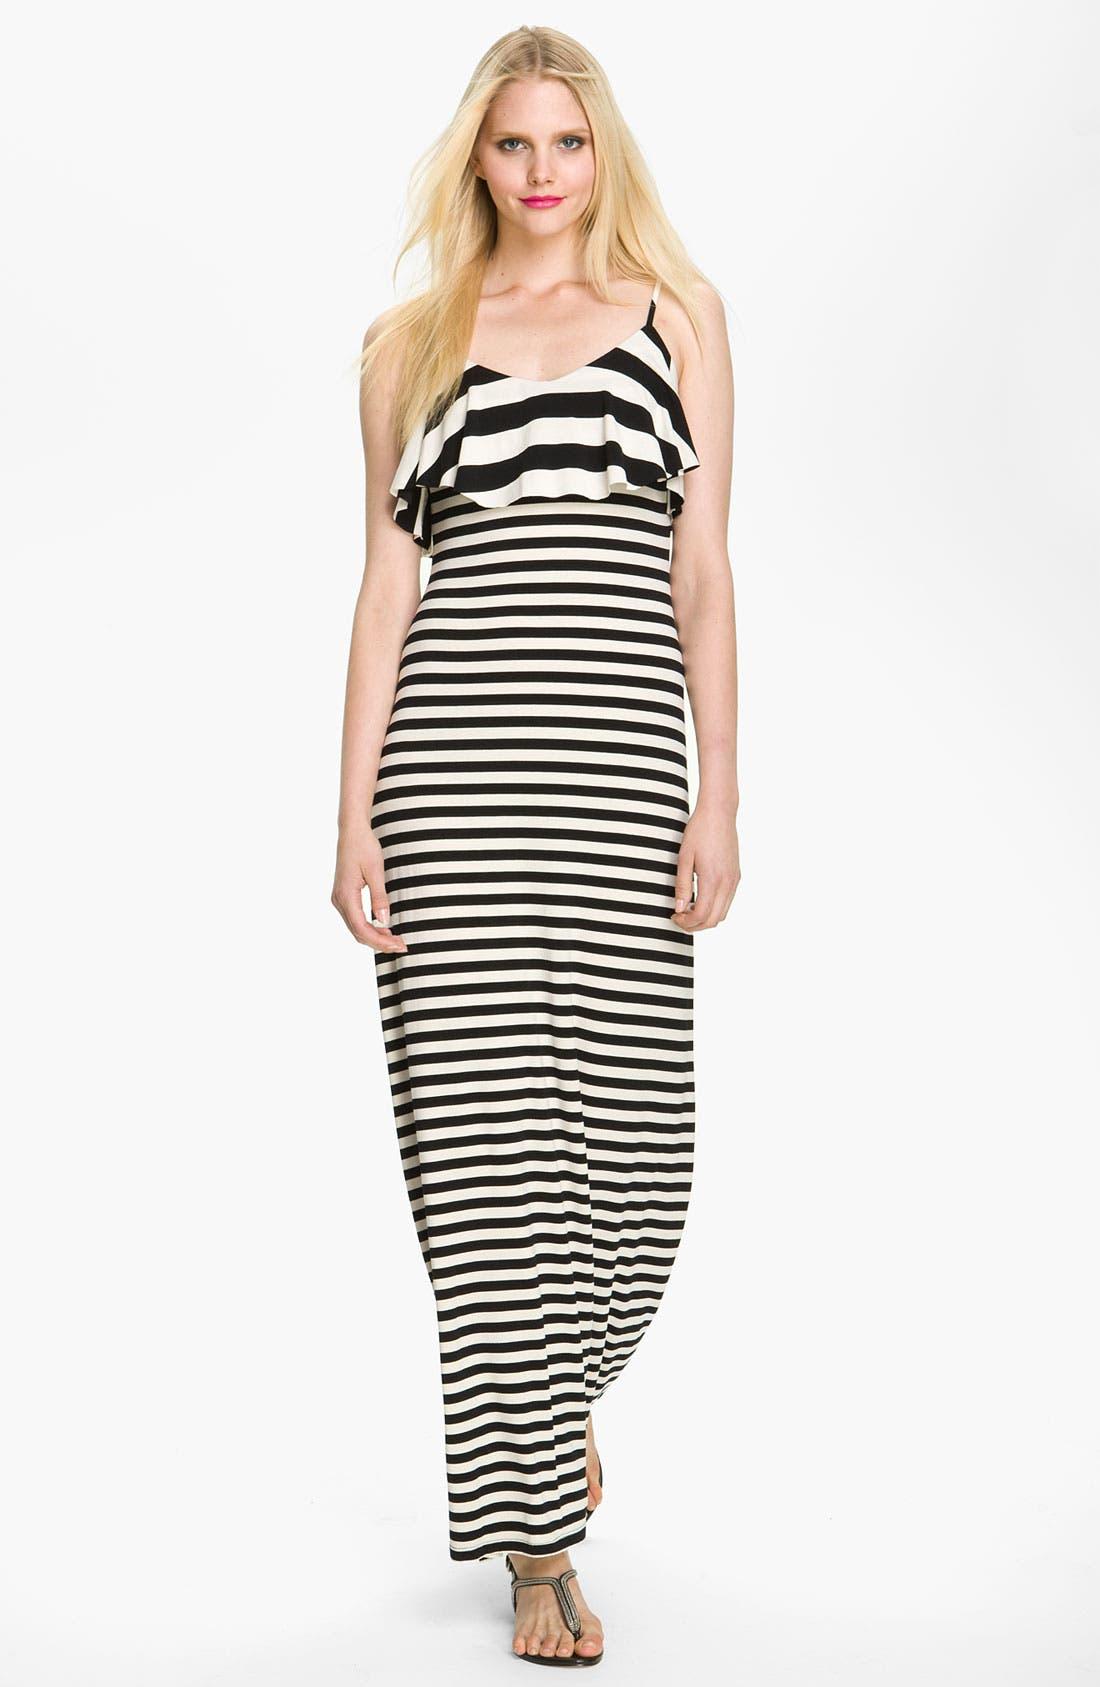 Alternate Image 1 Selected - Seamline Cynthia Steffe 'Leslie' Print Ruffle Front Maxi Dress